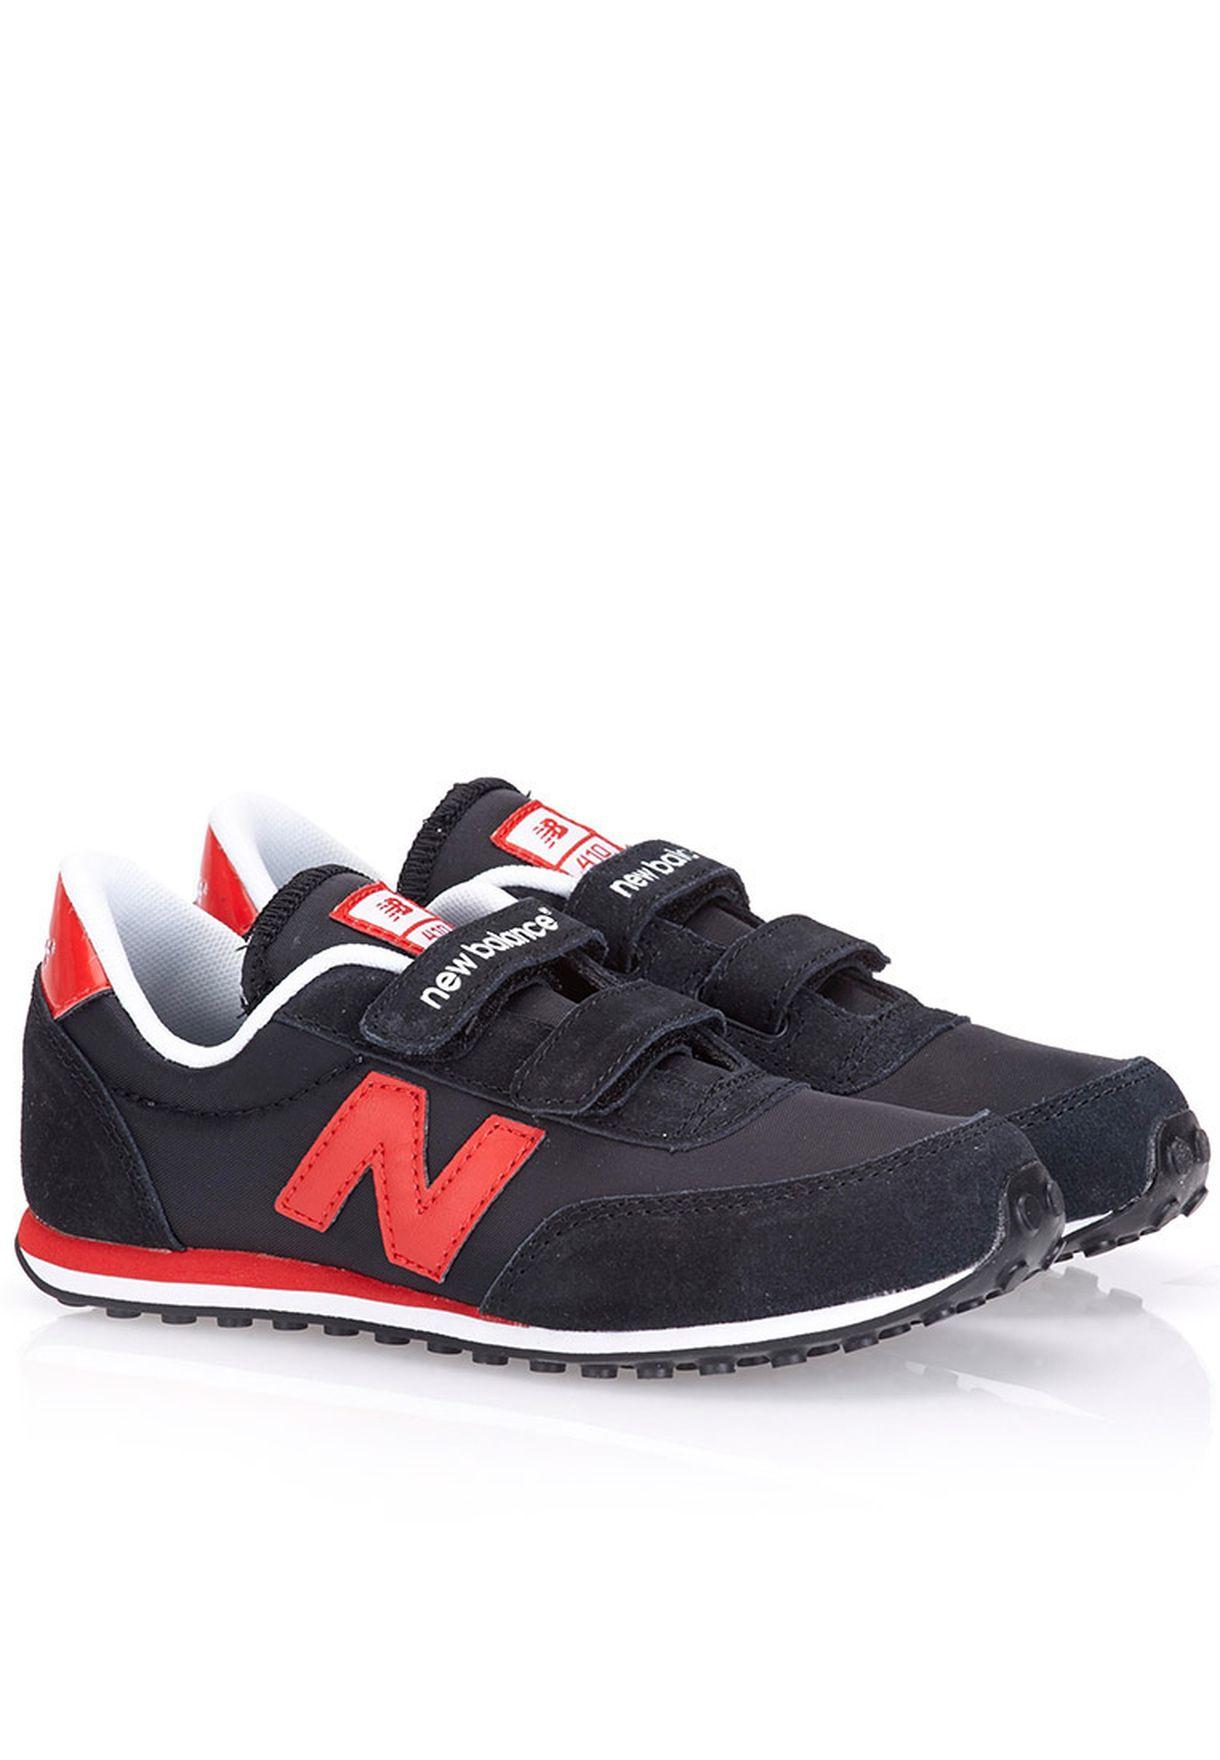 new balance 410 kids sneakers